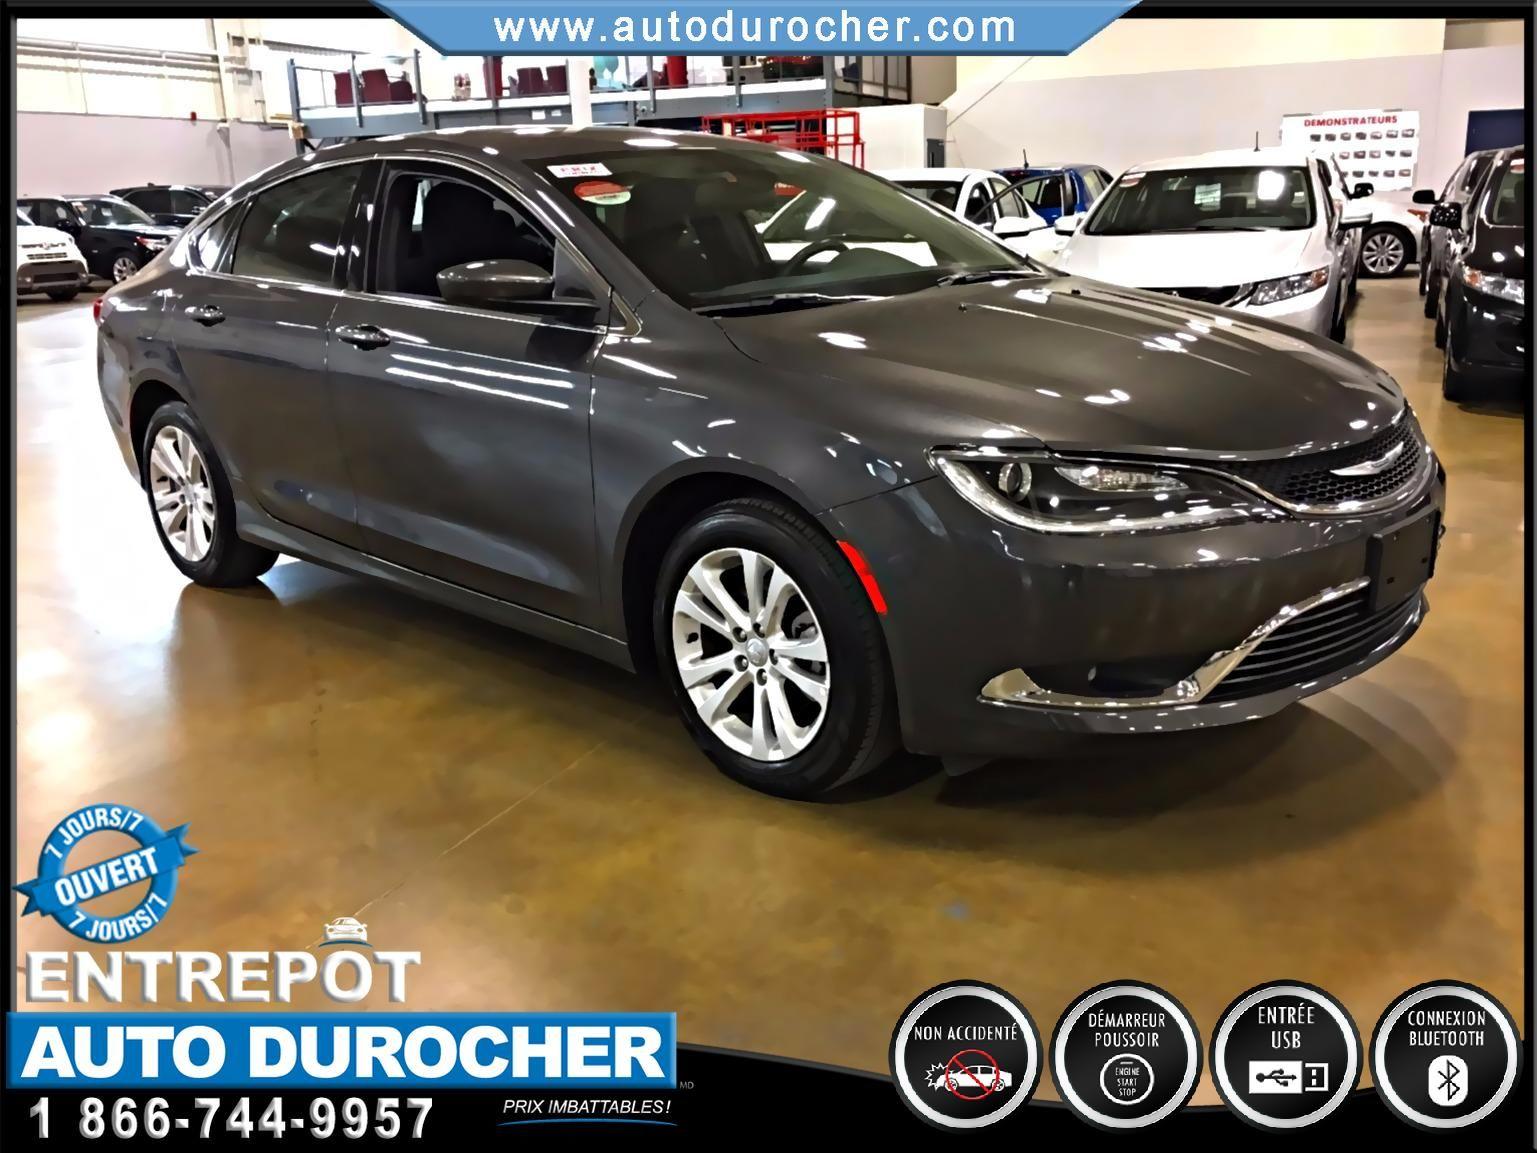 Chrysler 200 LIMITED, AUTOMATIQUE, JANTES, BLUETOOTH, UCONNECT 2016